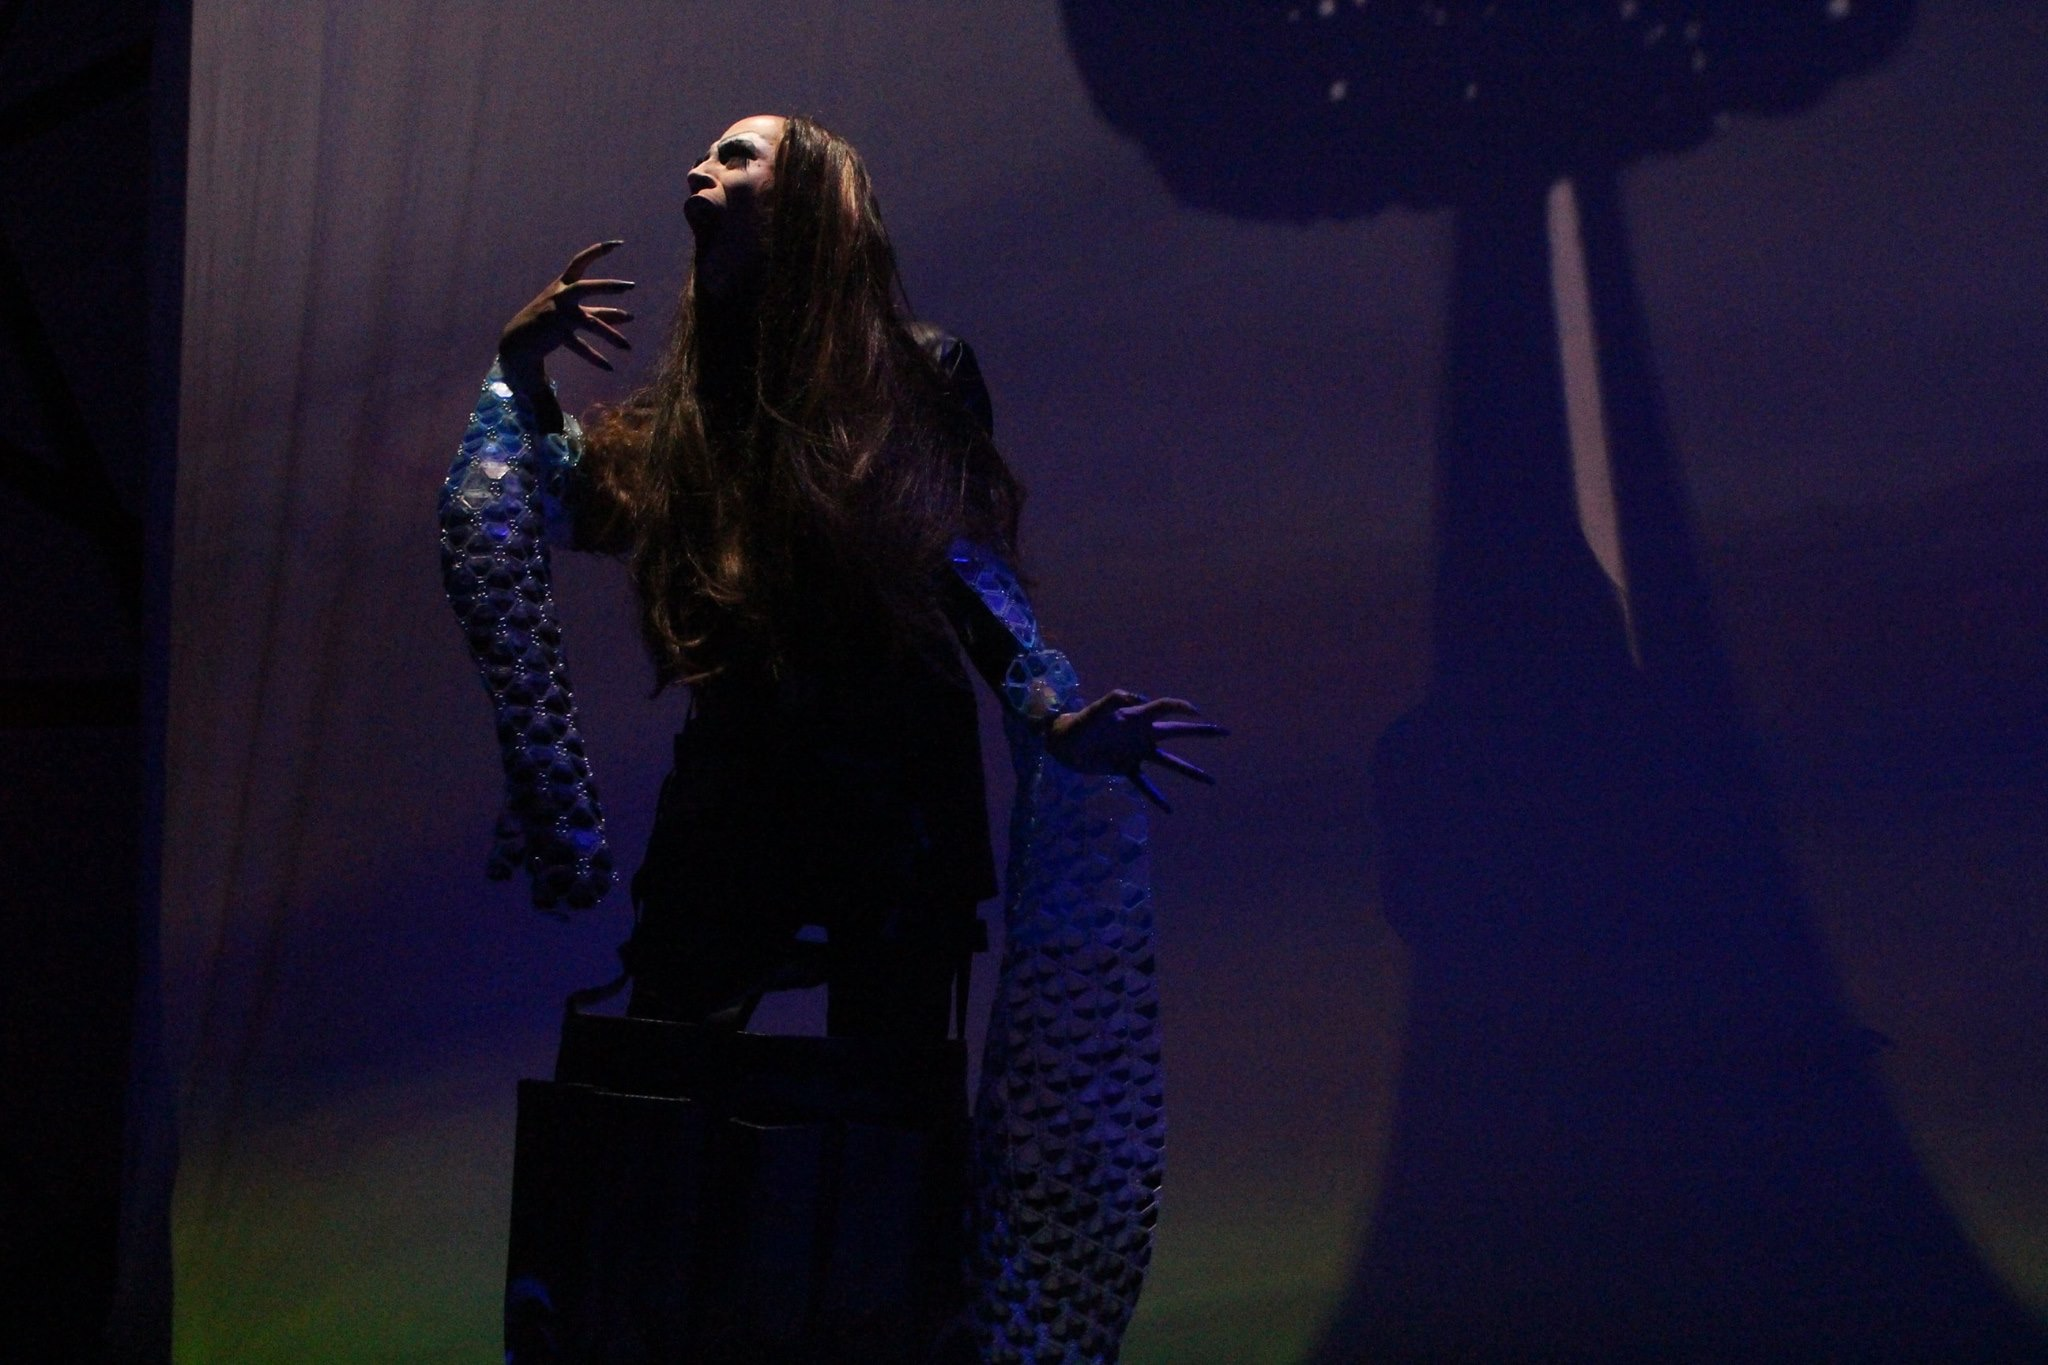 Seen: Sasha Velour's Nightgowns - November 2017 Piece: Long Sleeve Liquid Top Performer: Untitled Queen Music: Christ Garneau - Black & Blue Venue: National Sawdust